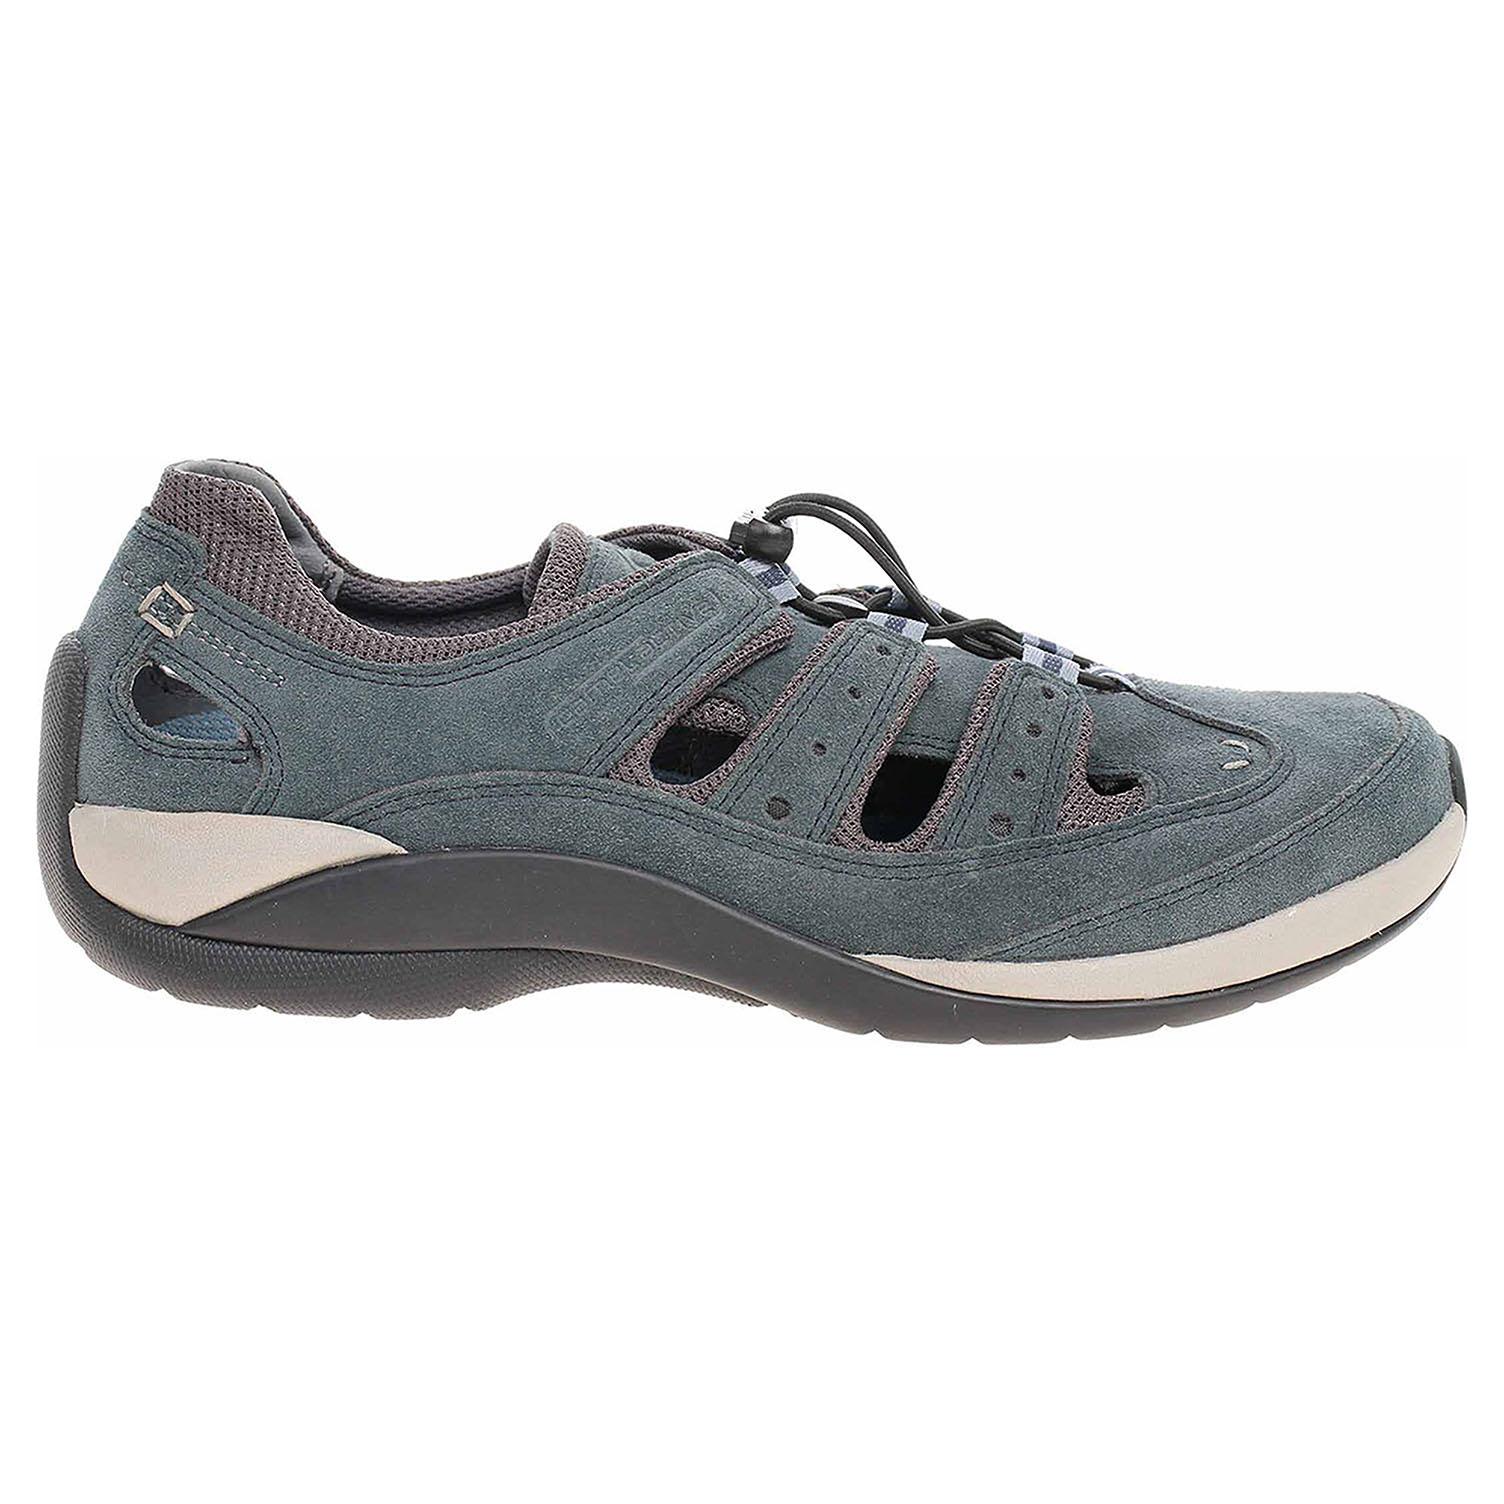 Ecco Camel Active pánské sandály 462.12.30 navy-grey 24700264 5c0279bfff